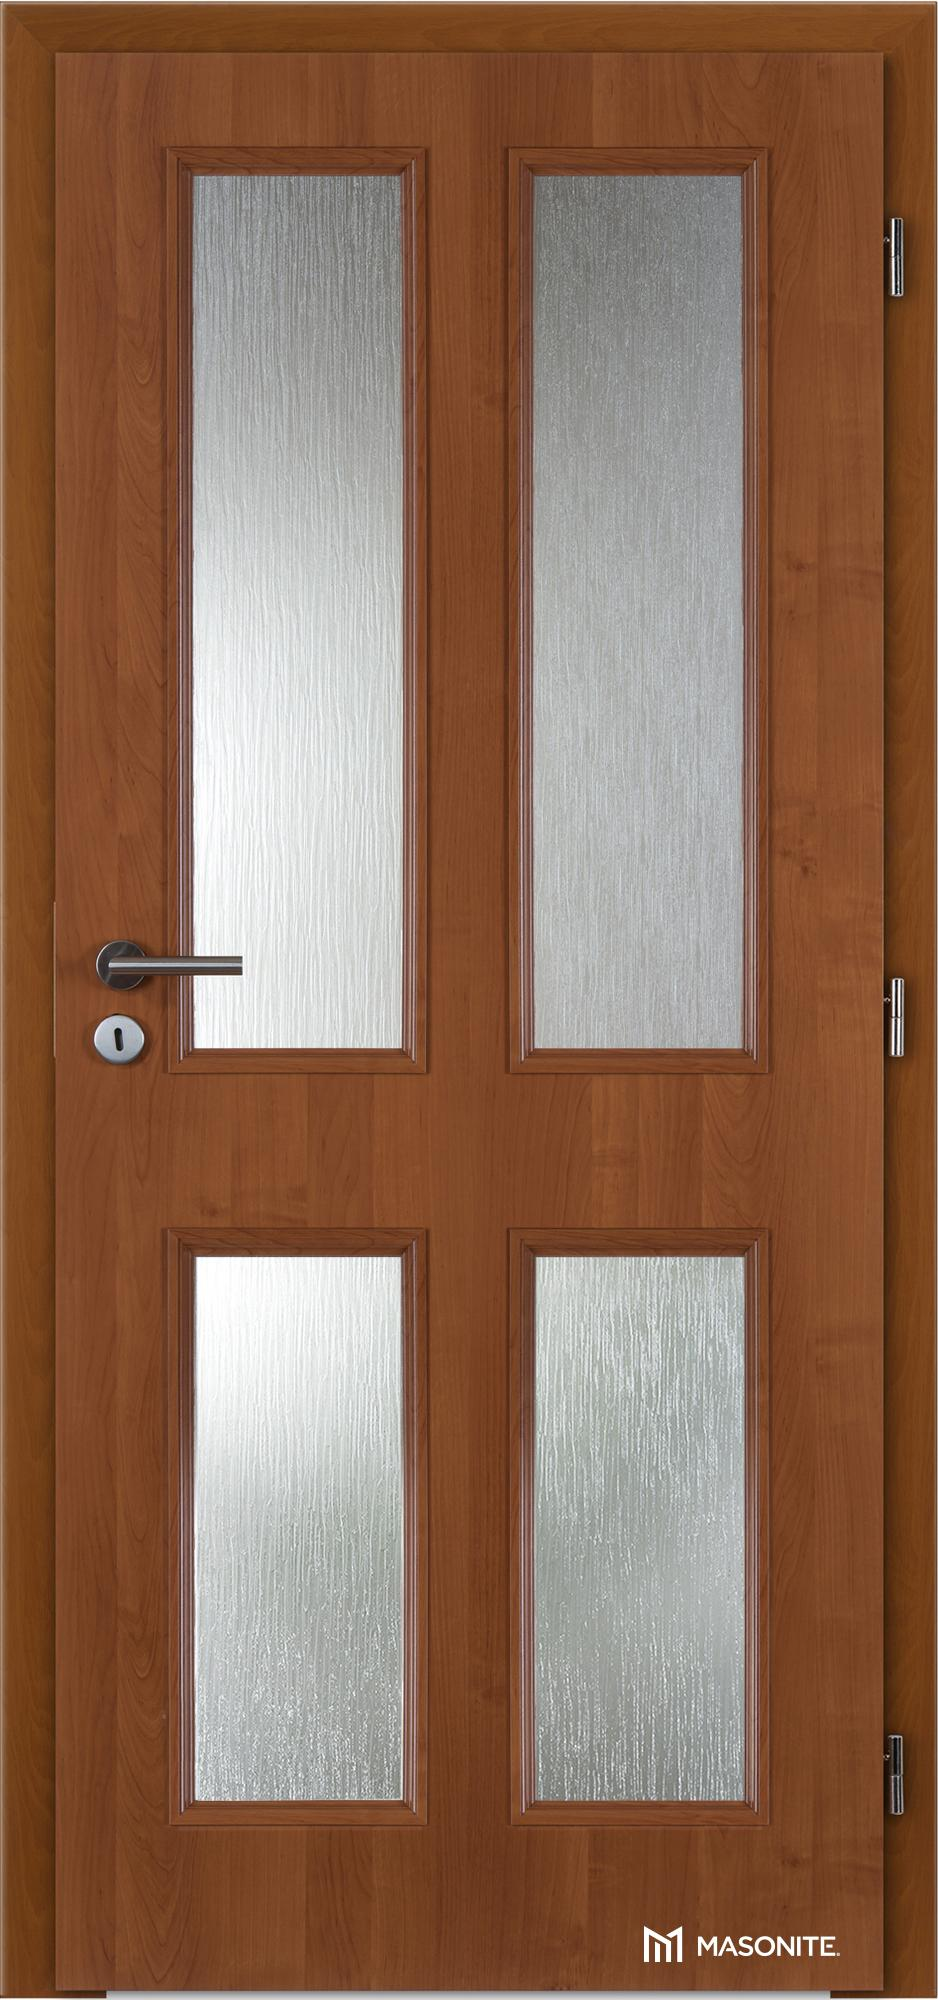 MASONITE - HECTOR CLASSIC DEKOR - PVC